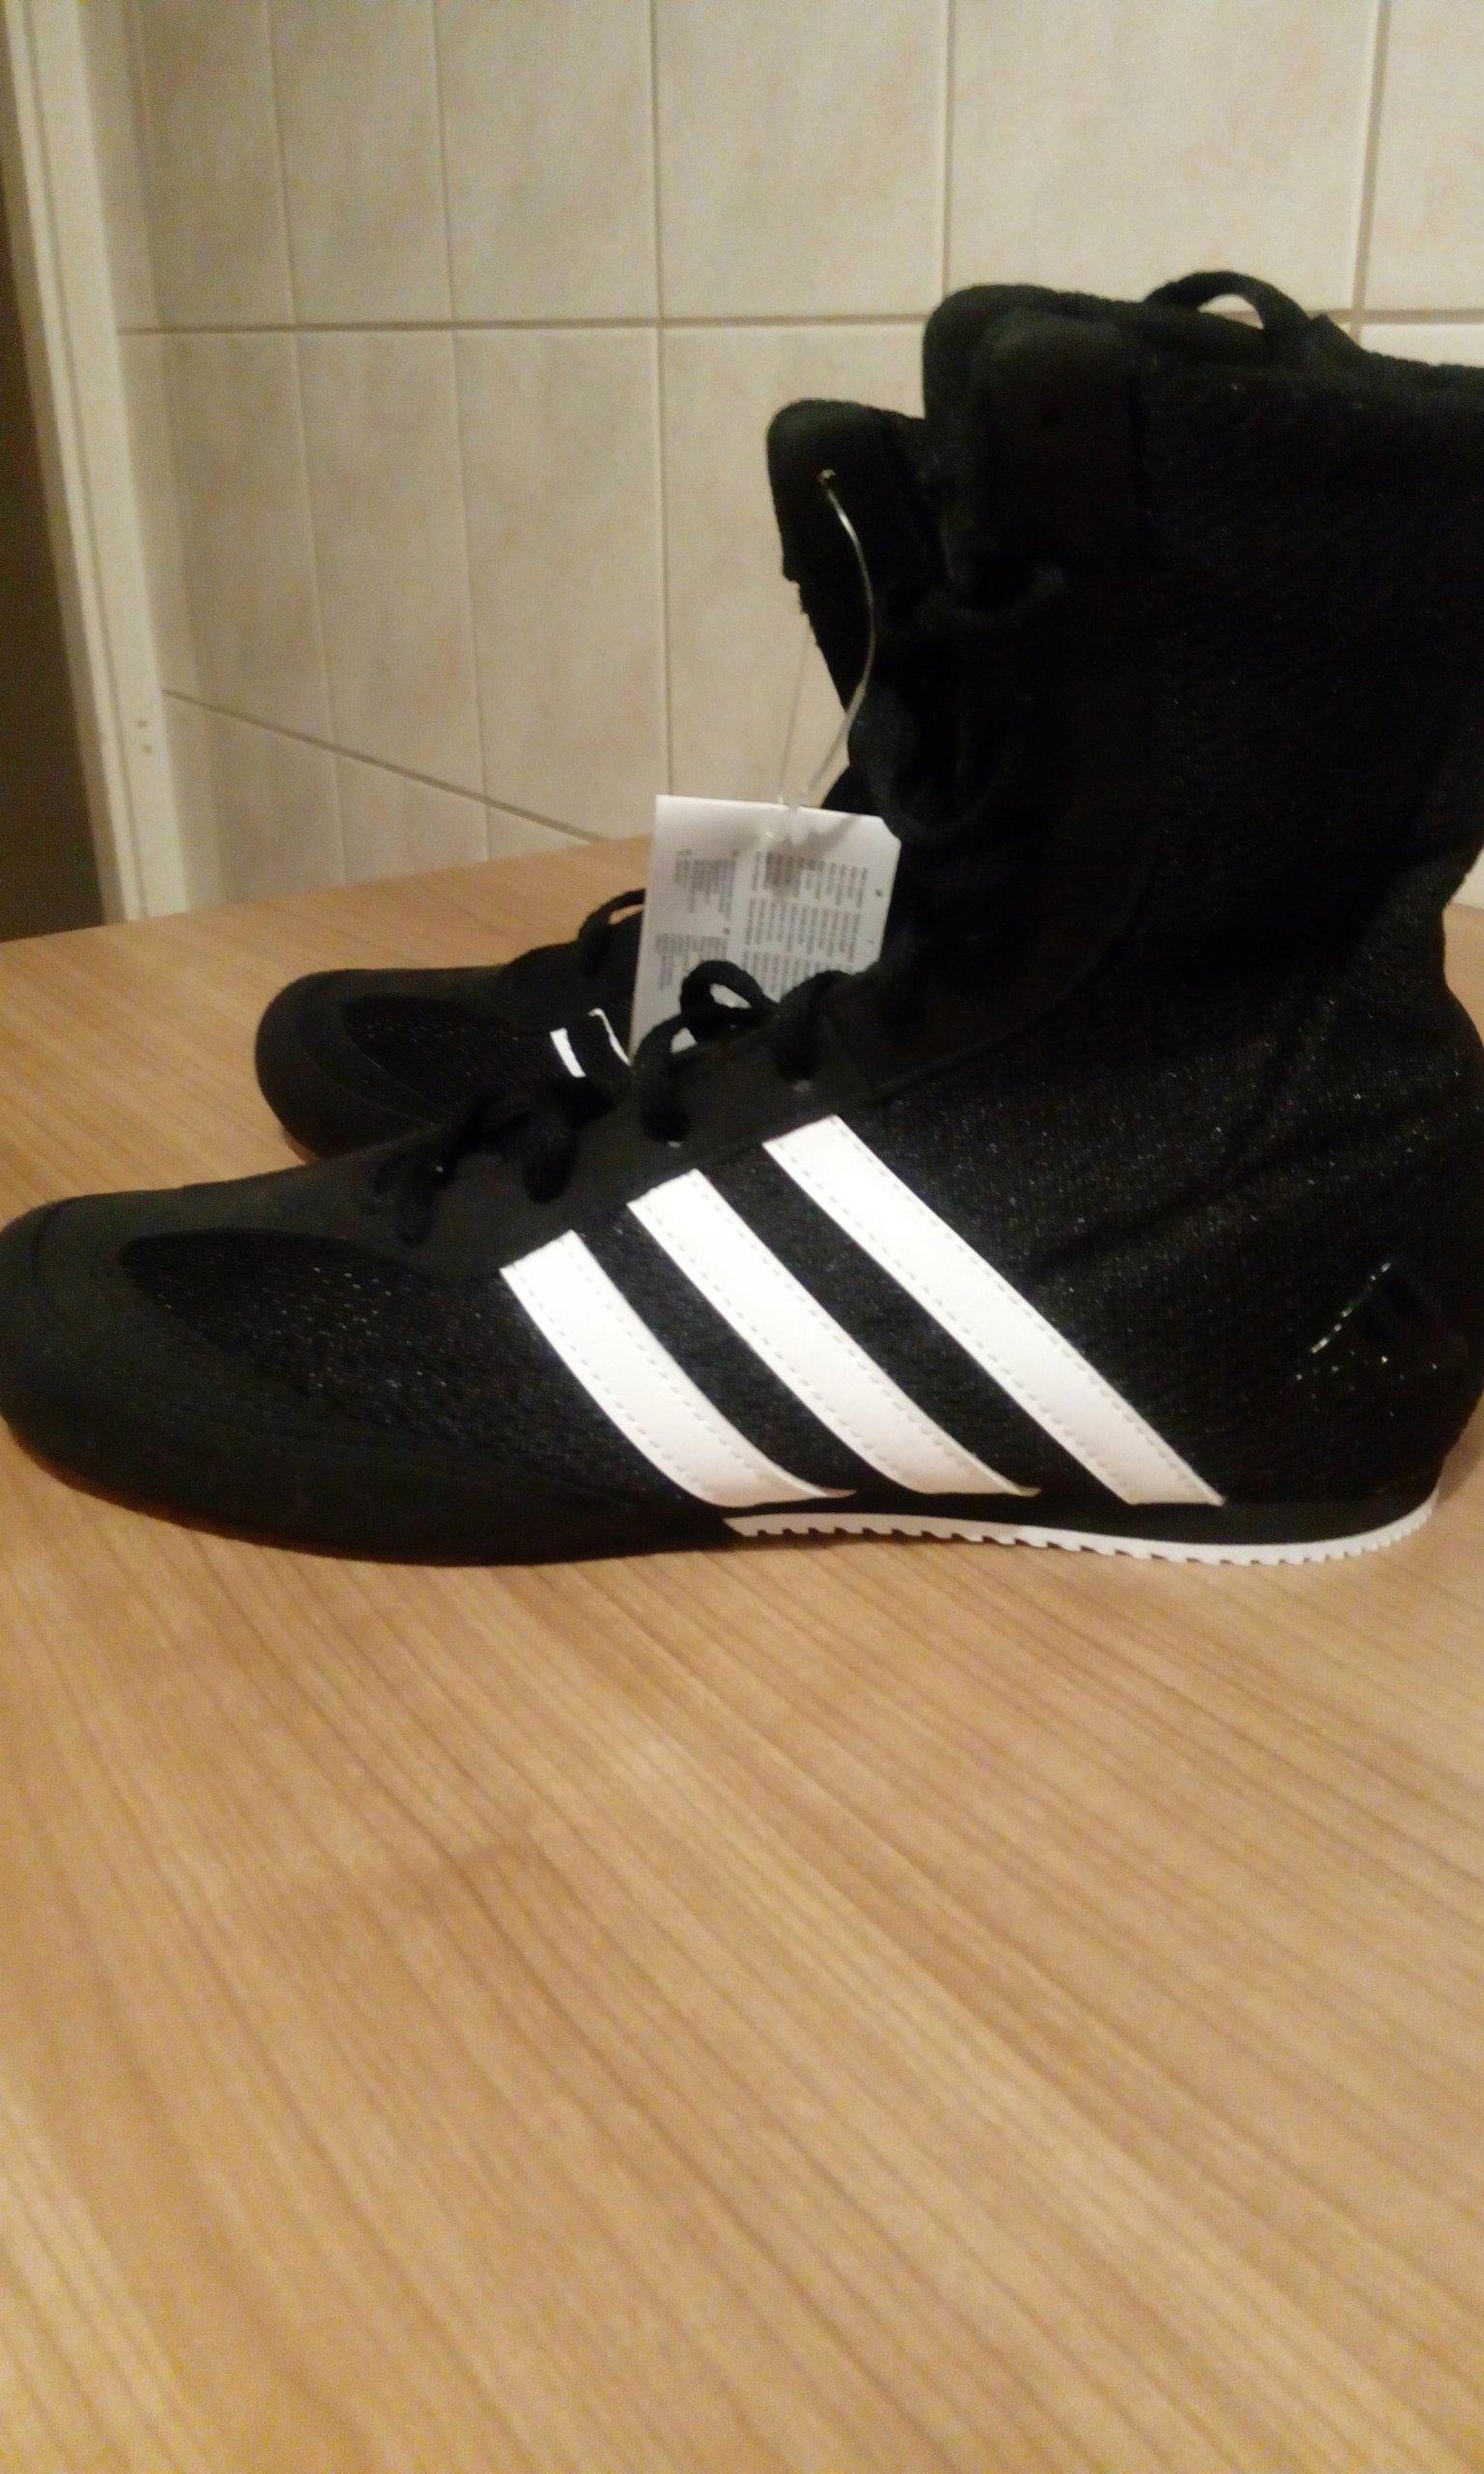 Adidas KO Legend 16.2 _Buty Bokserskie___40 23